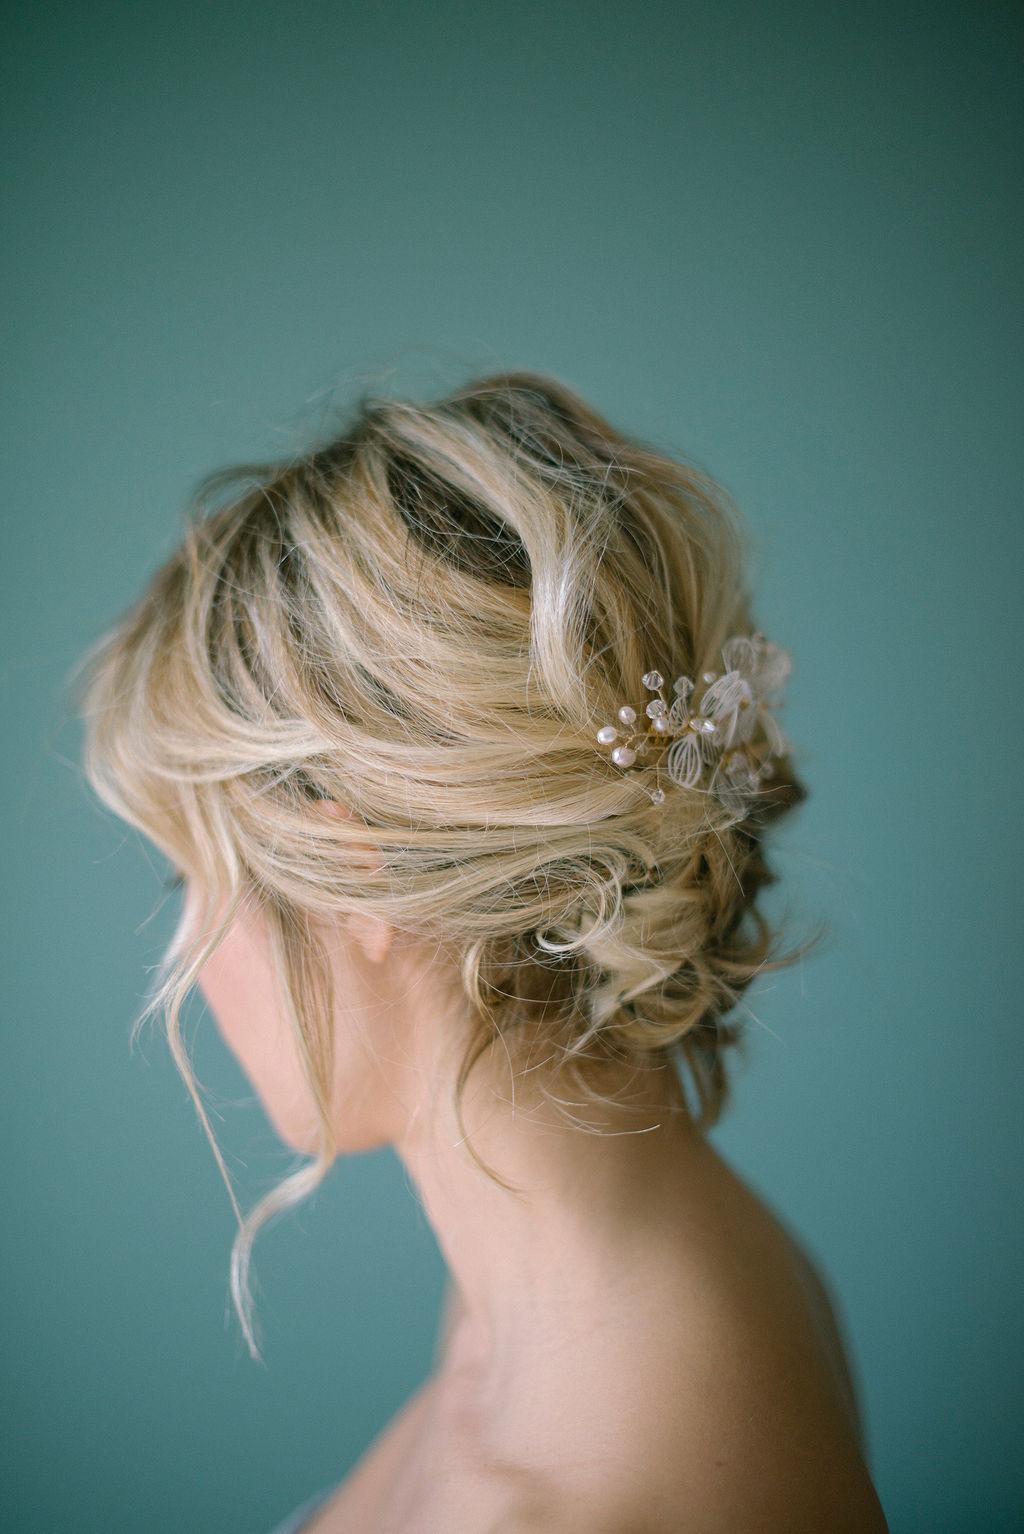 FashioneditorialSabben-Bo&luca-EmmanuelleMarty-webPhotography-23